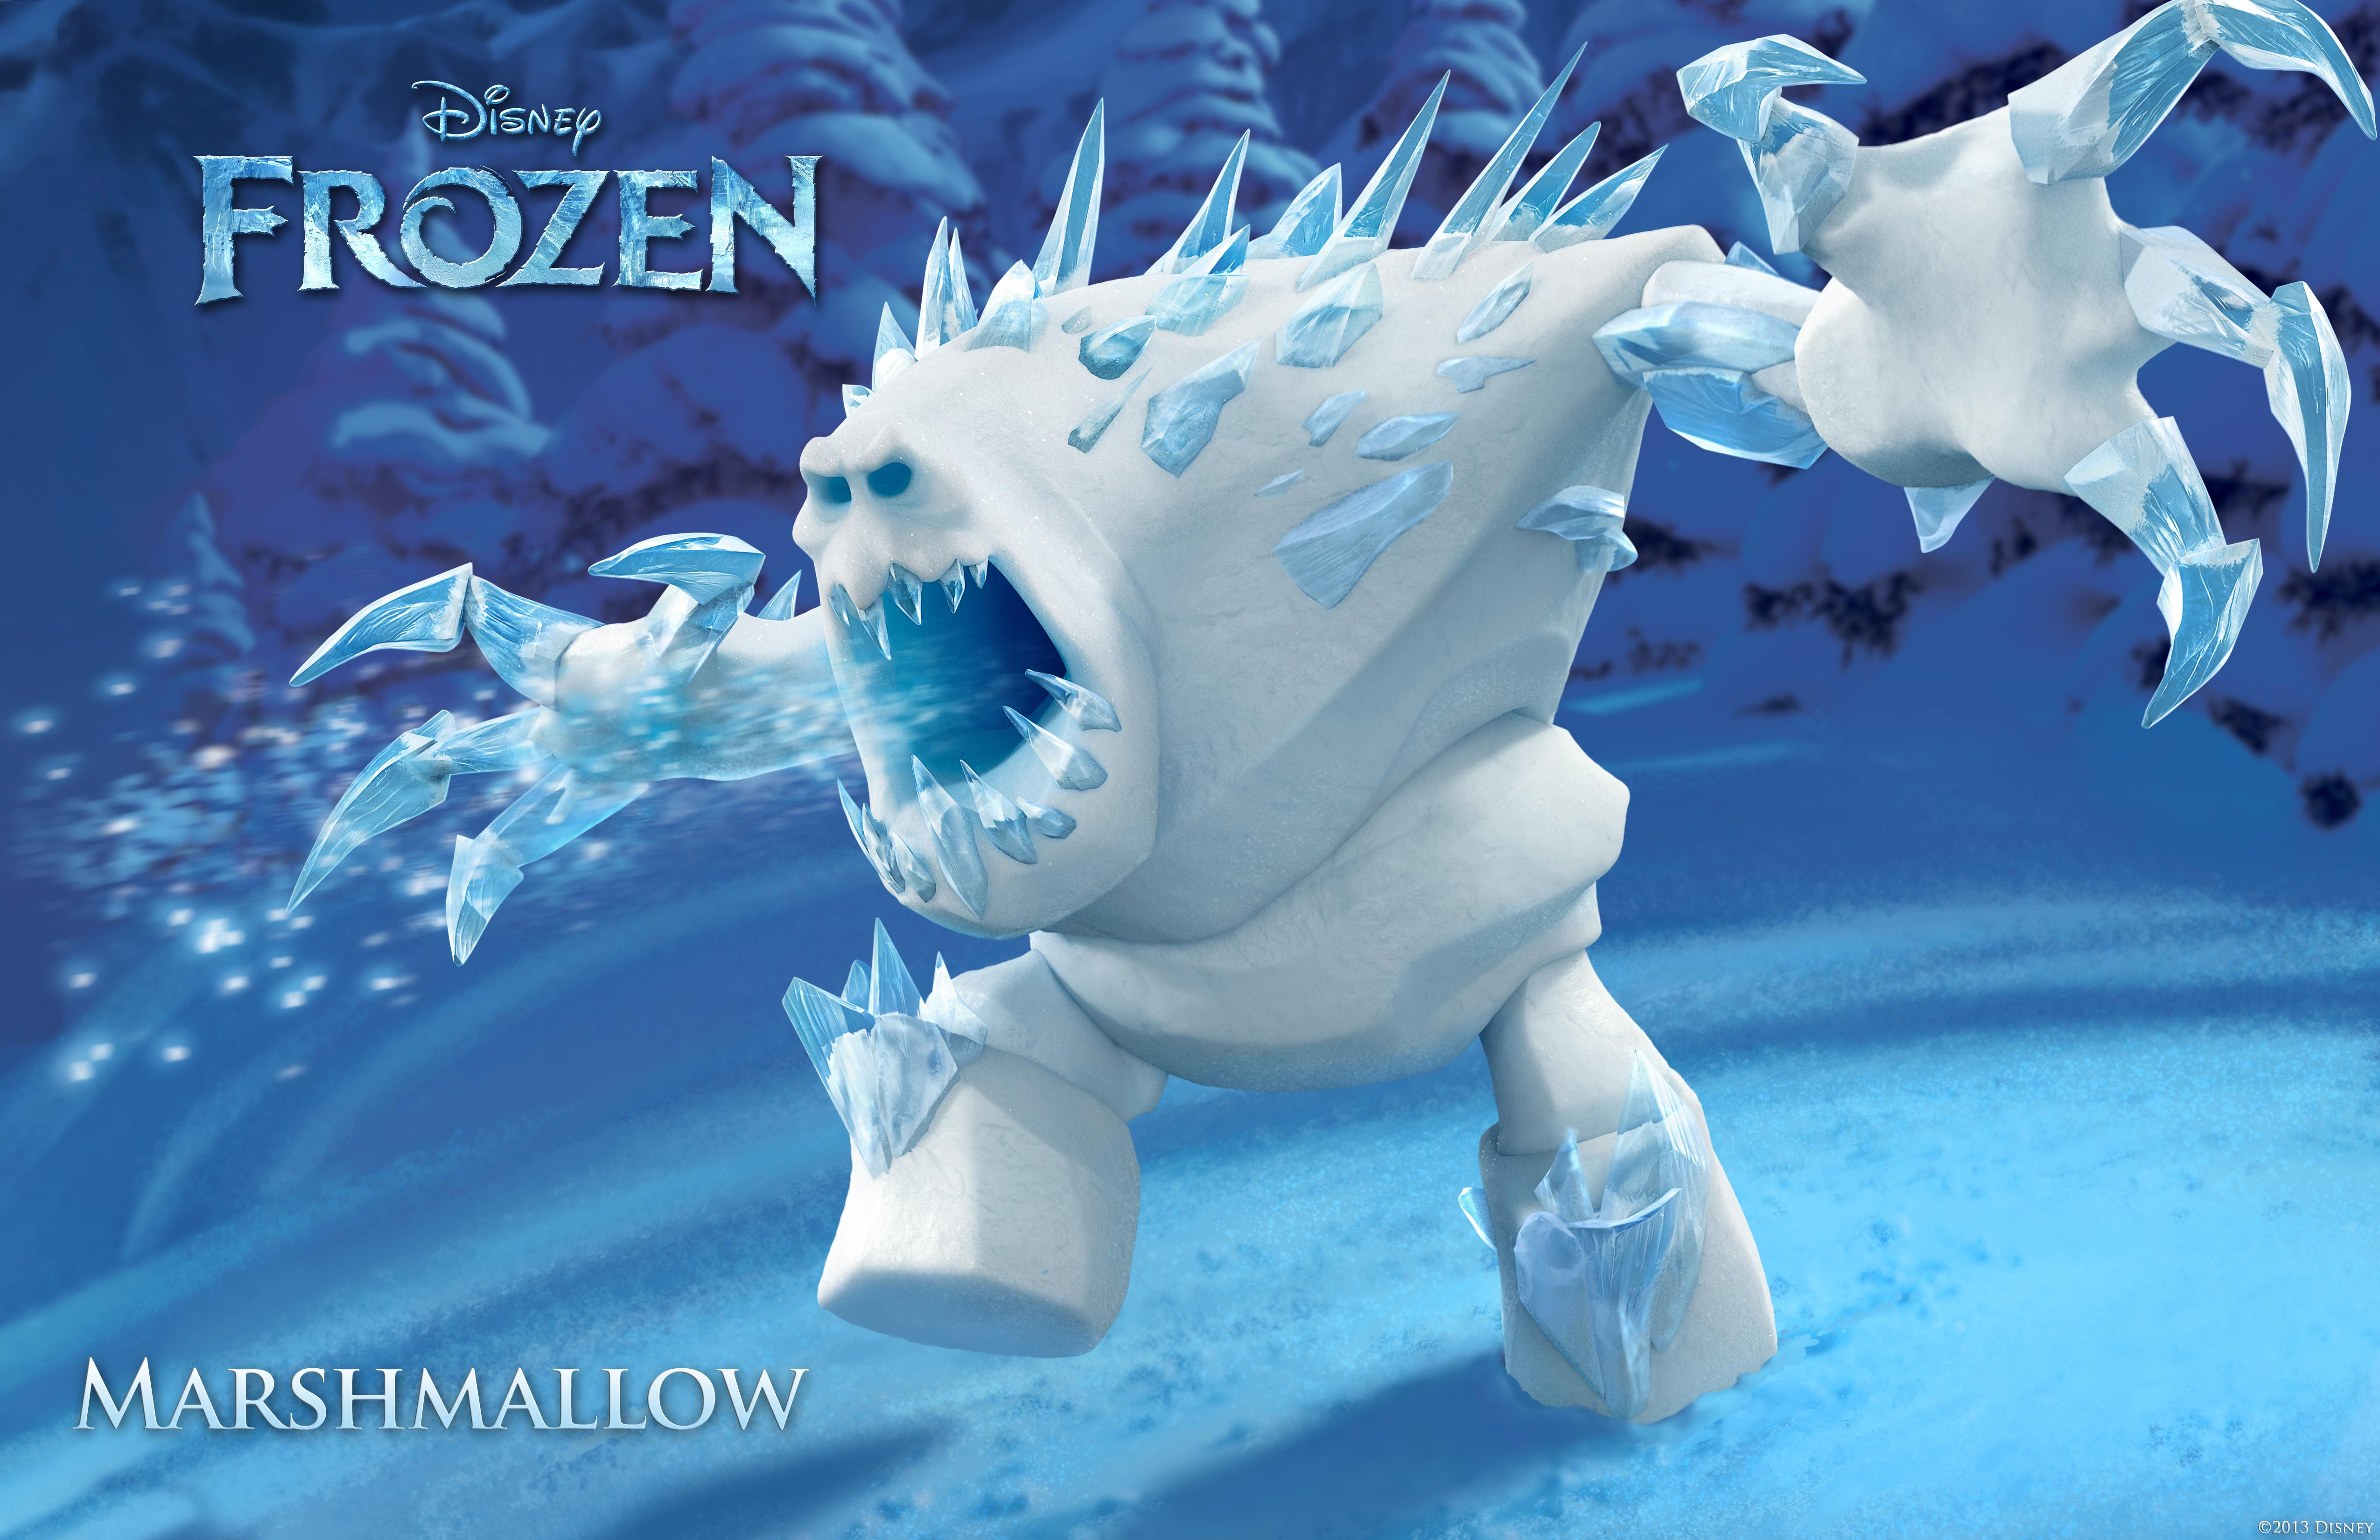 Frozen wallpaper 9